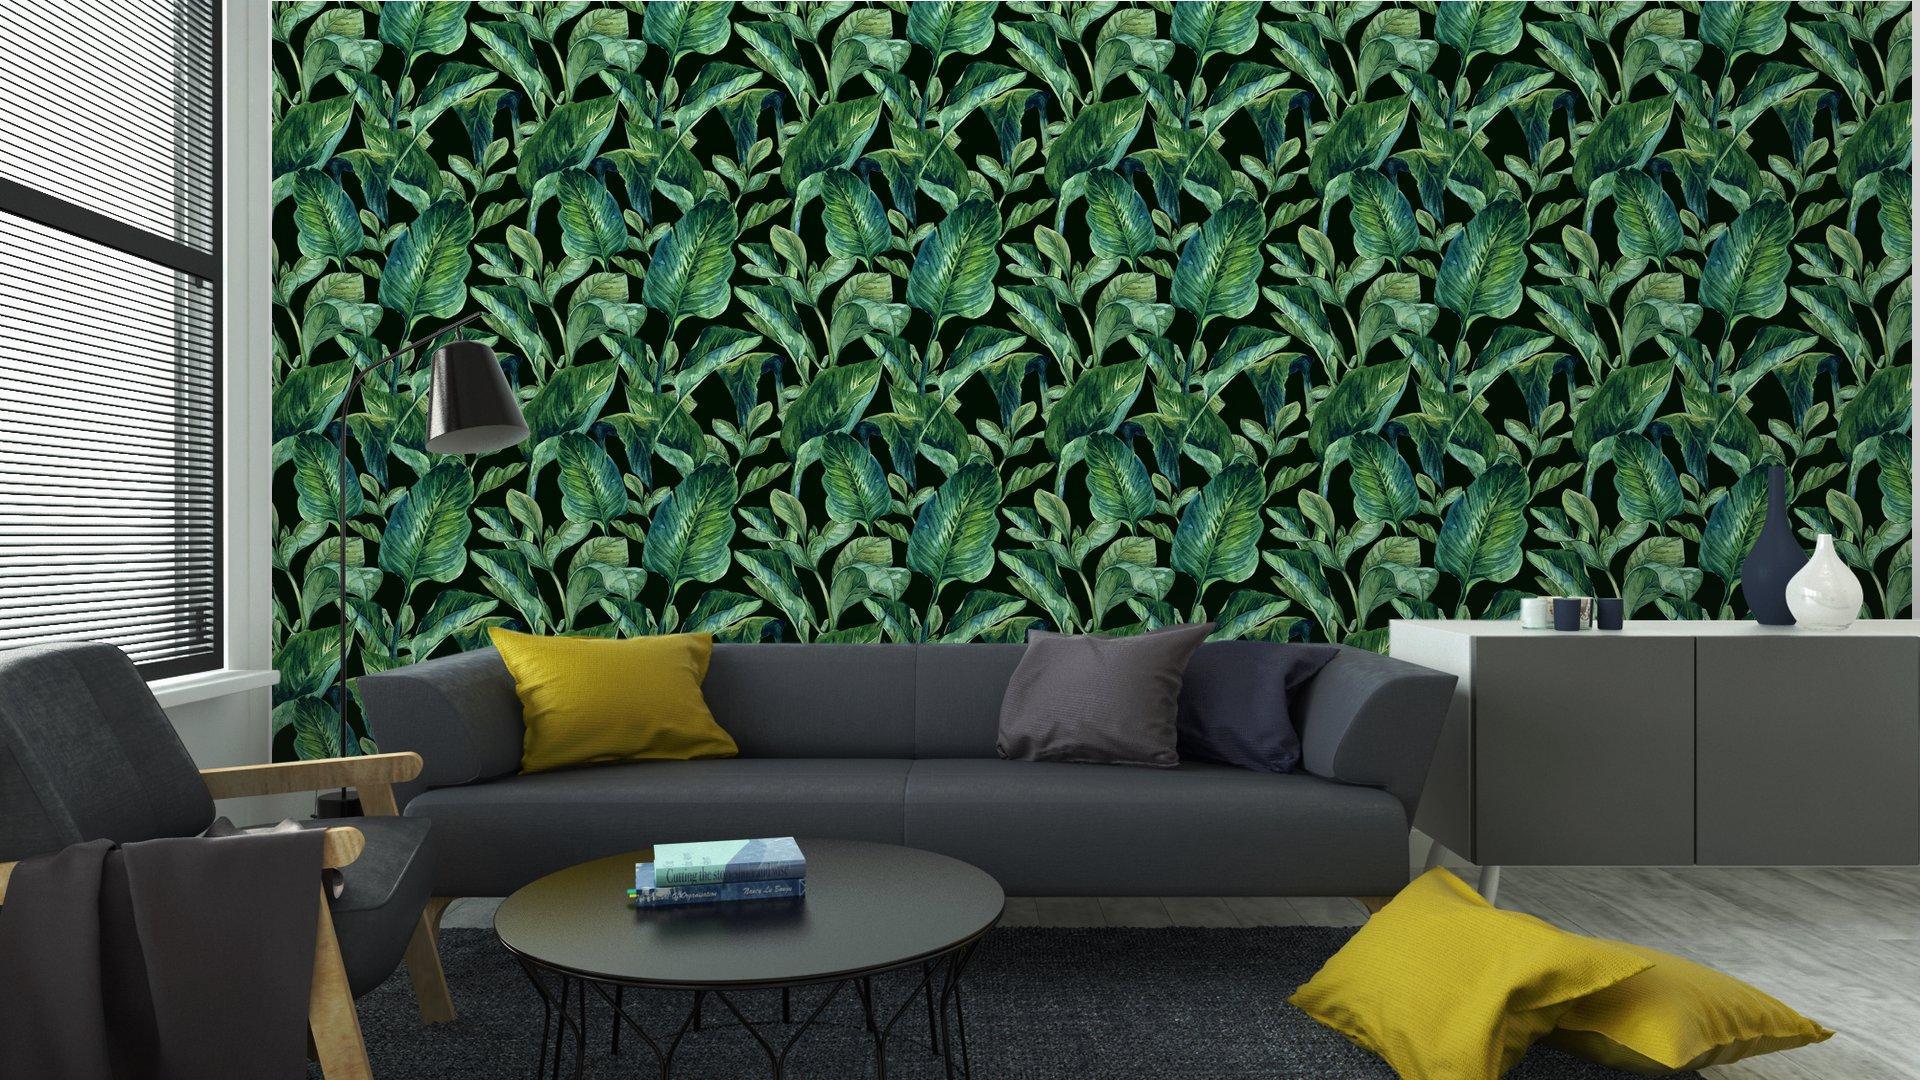 Fotomurales mexico papeles pintados lavables fondo inconsutil de la acuarela con hojas tropicales 4 - Papel Tapiz Hojas Tropicales en Fondo Negro 01